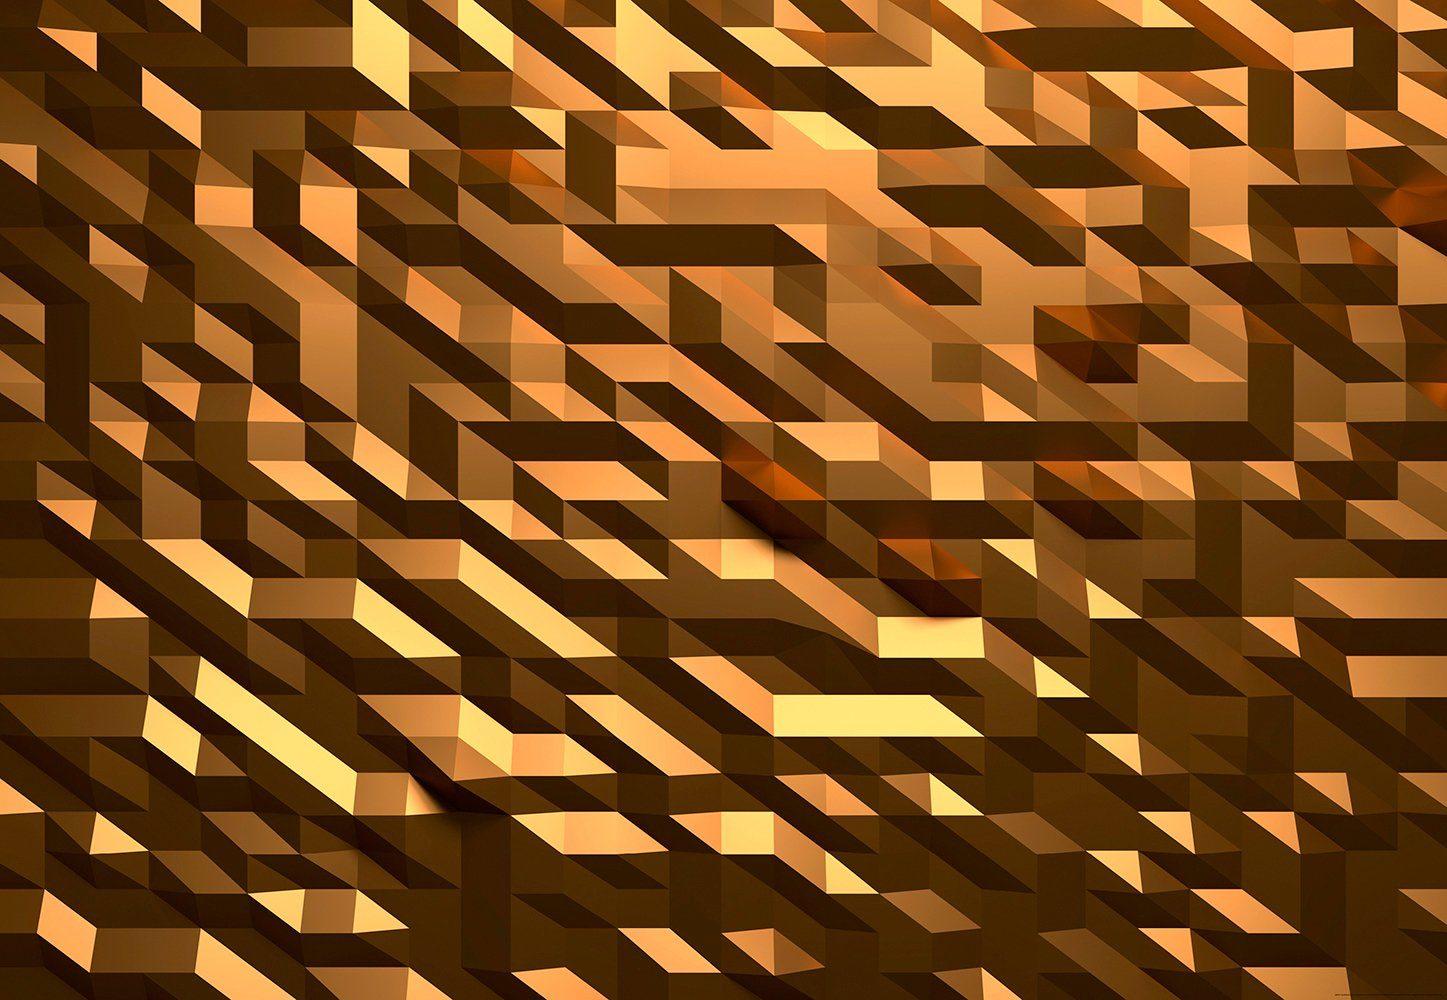 IDEALDECOR Fototapete »3D Kristall Gold«, Vlies, 4 Bahnen, 368 x 254 cm